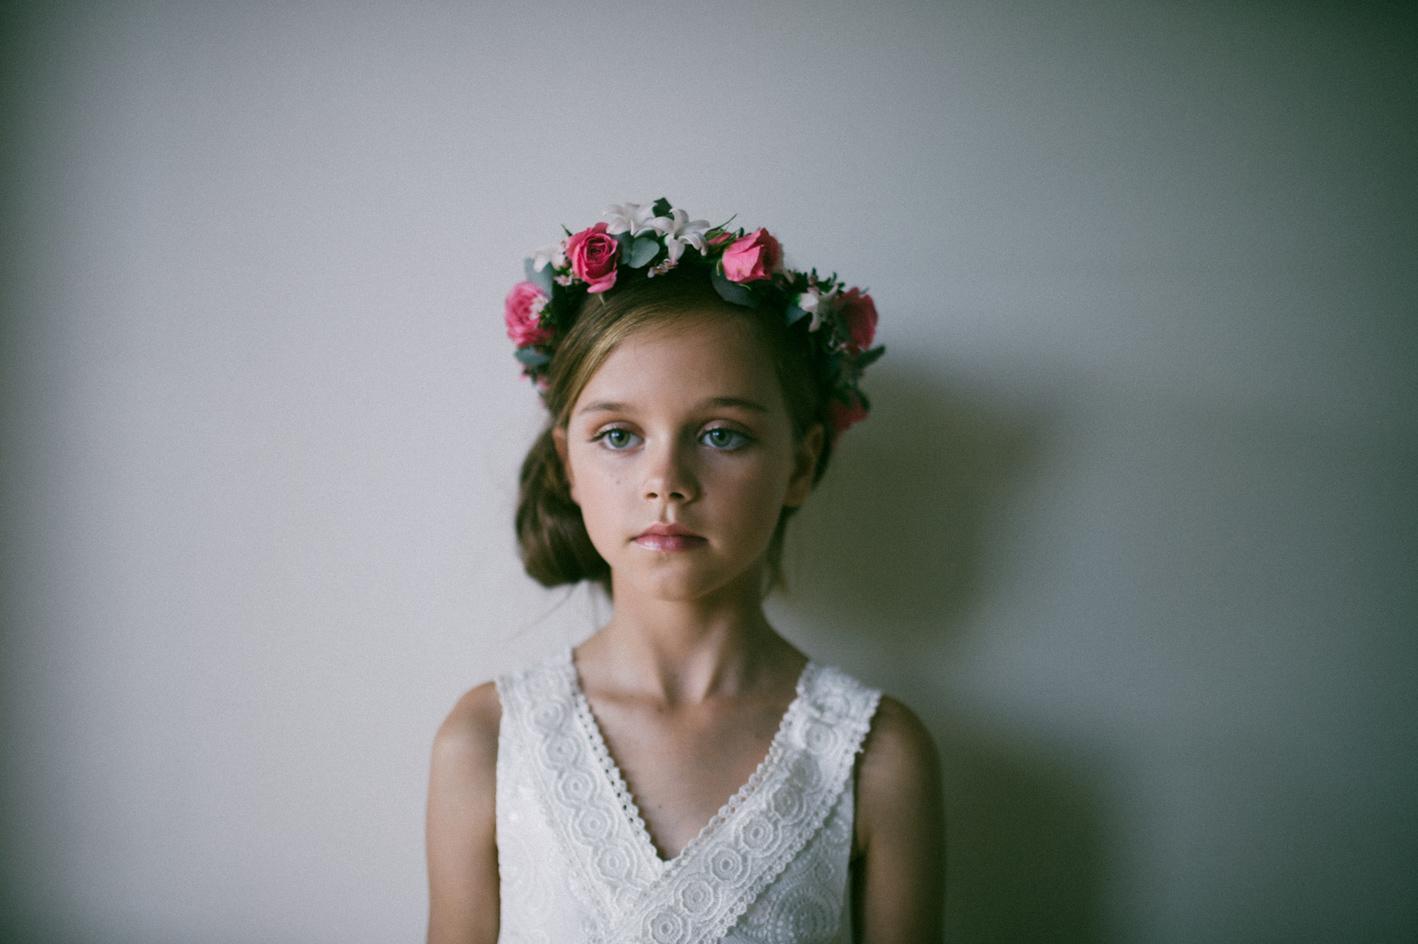 016-crown-of-eden-sophie-baker-photography